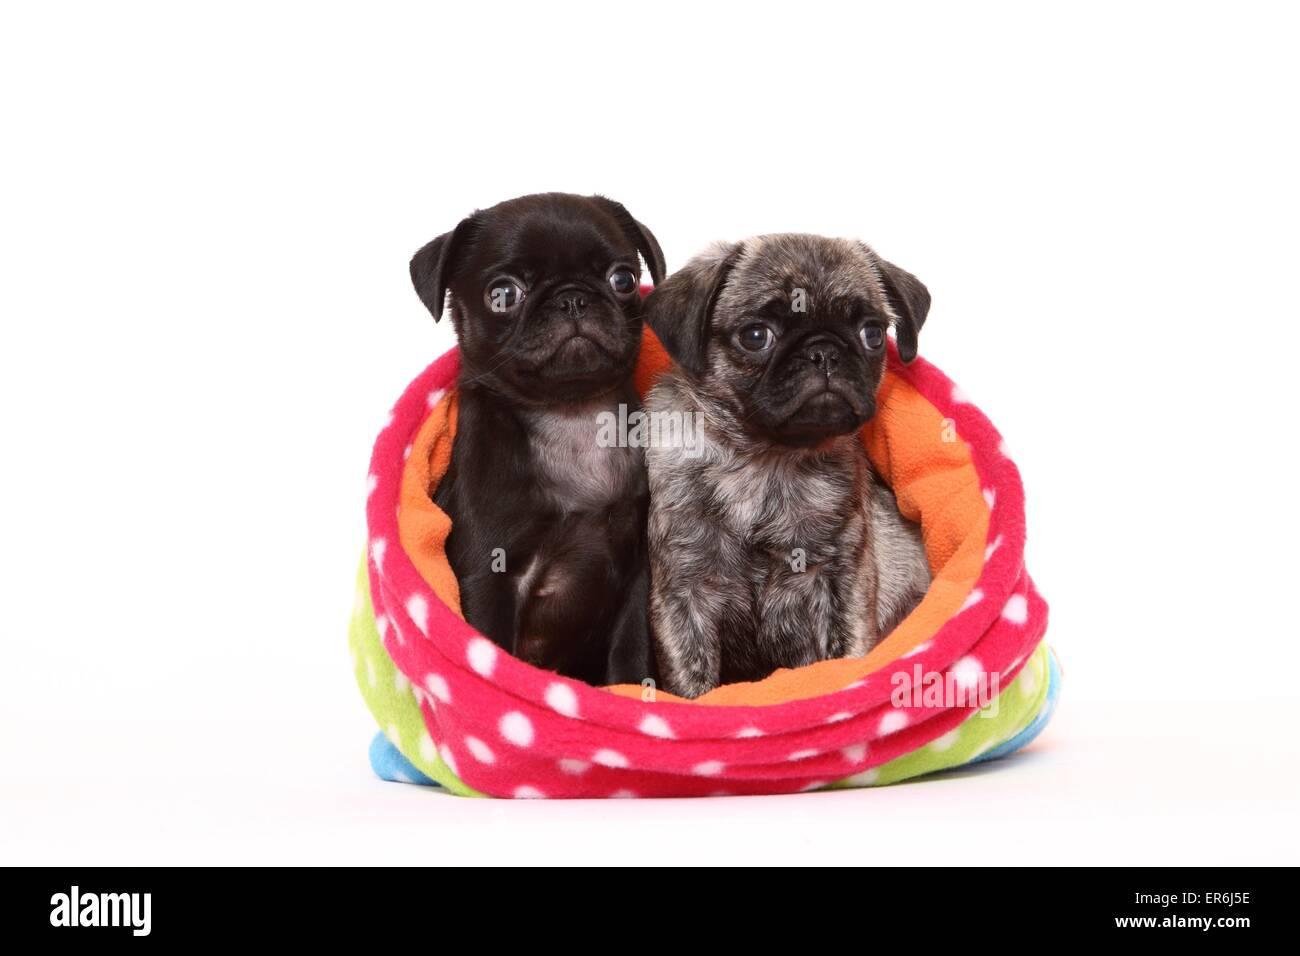 2 pug puppies - Stock Image